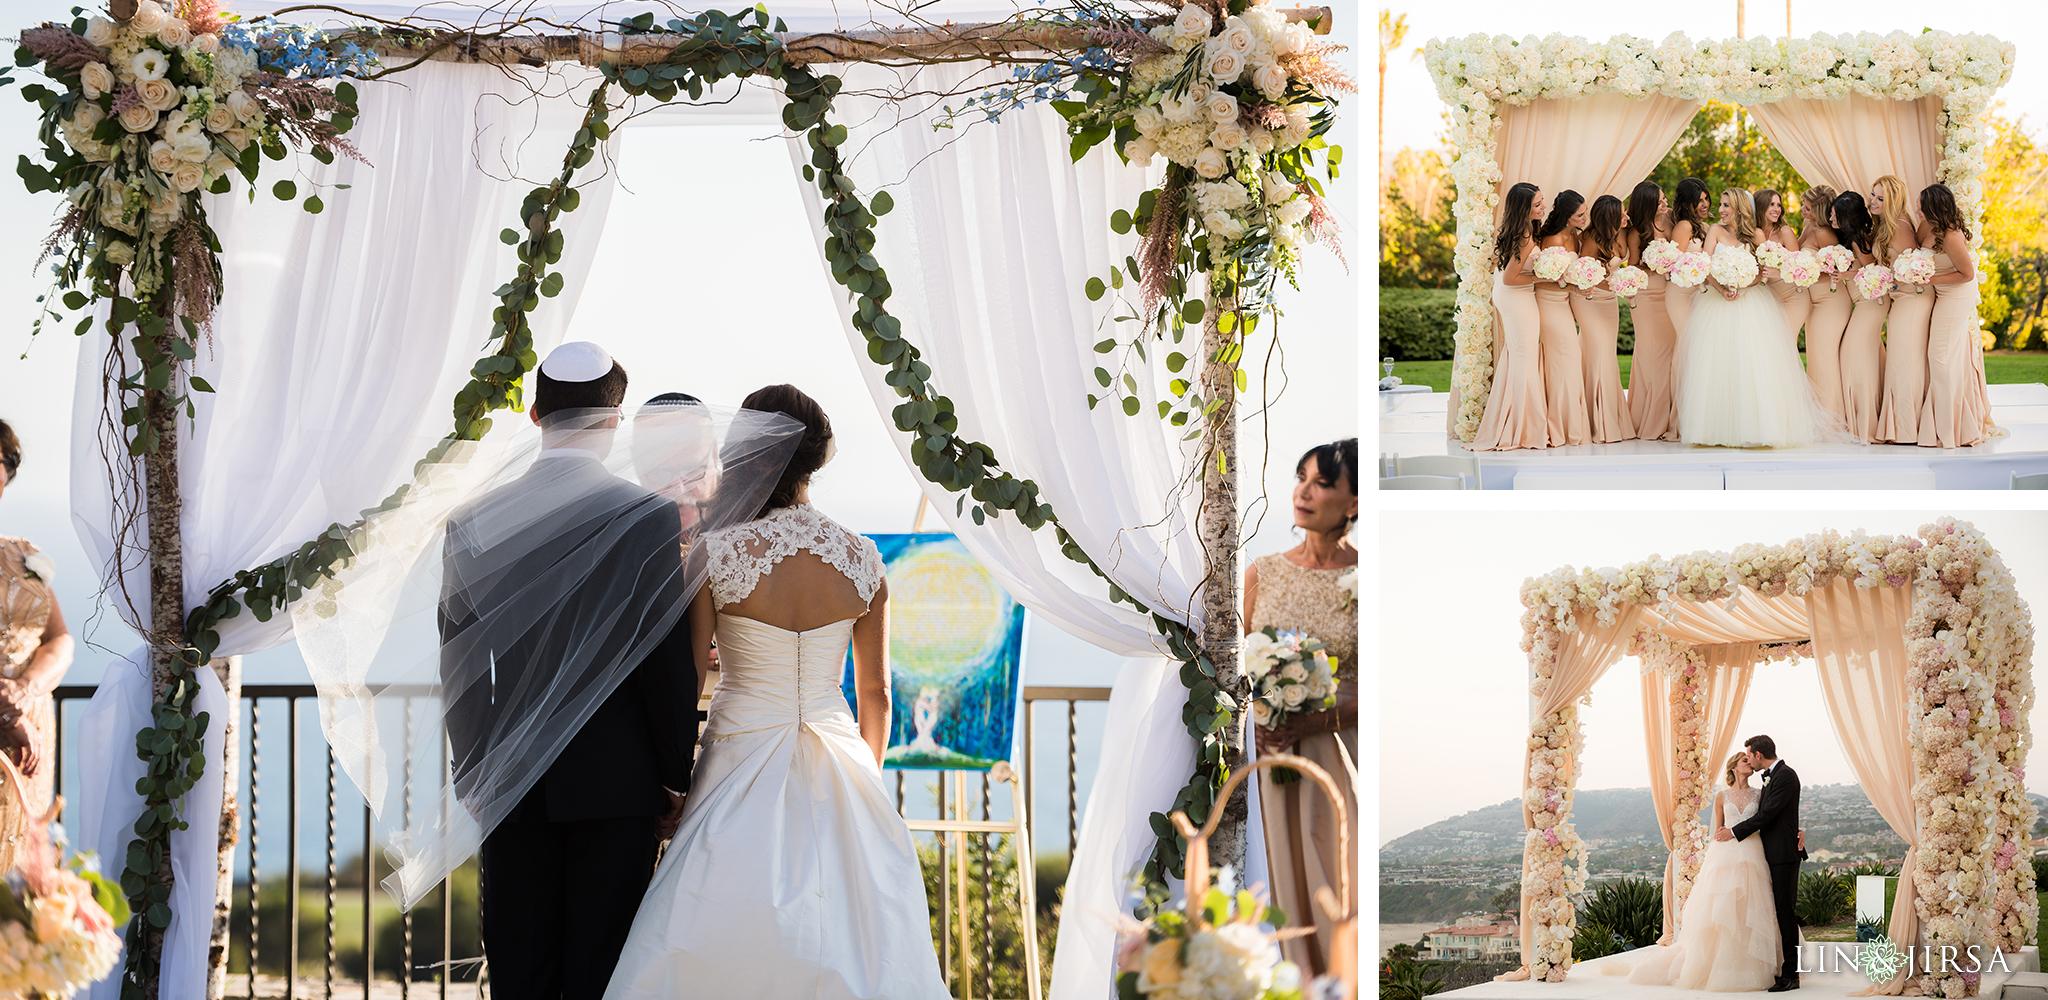 Spiritual Ceremonies Weddings